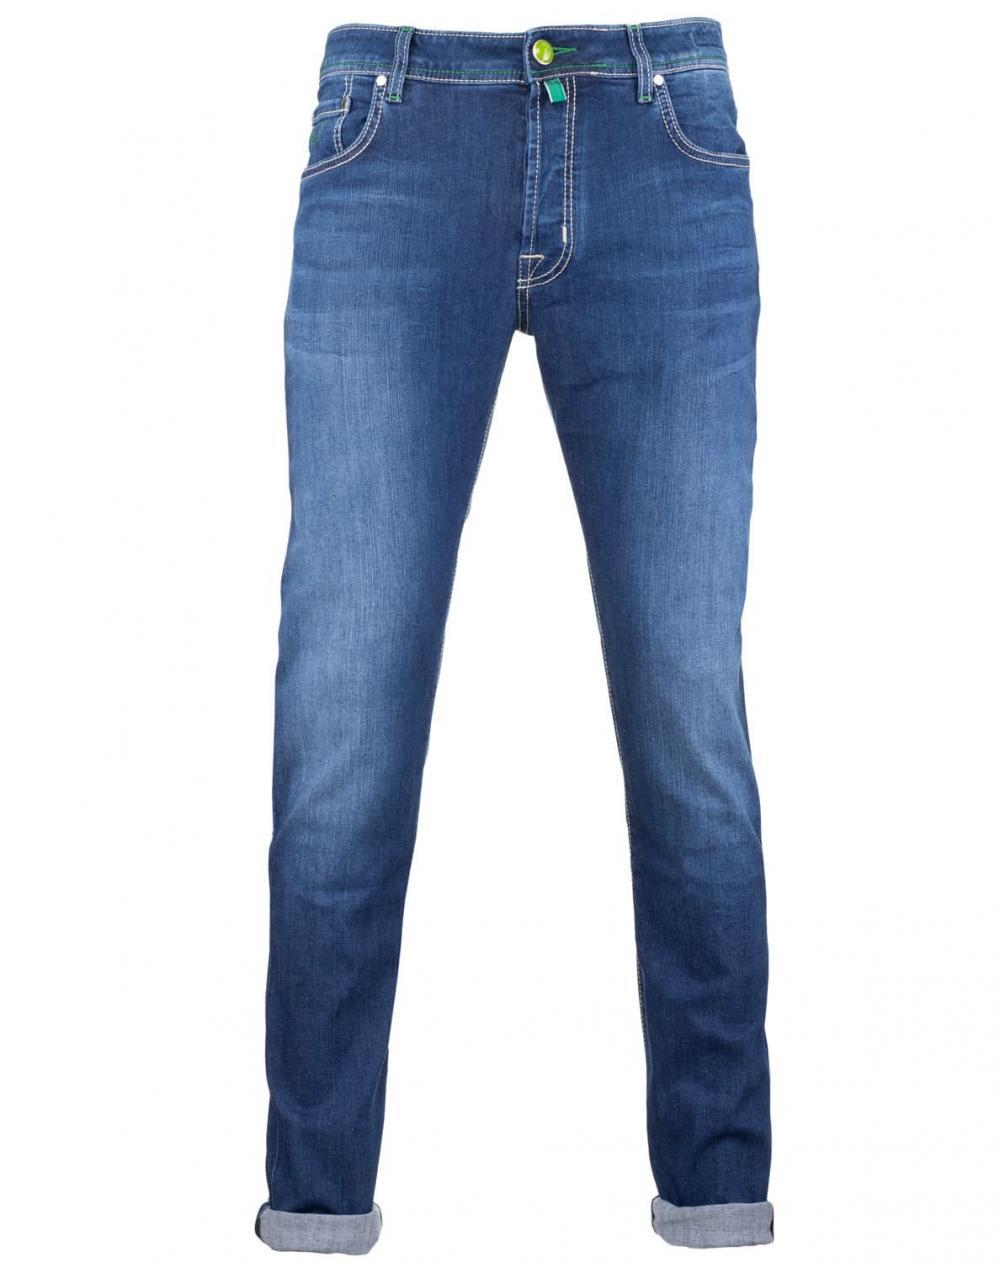 Jeans J688 Comfort